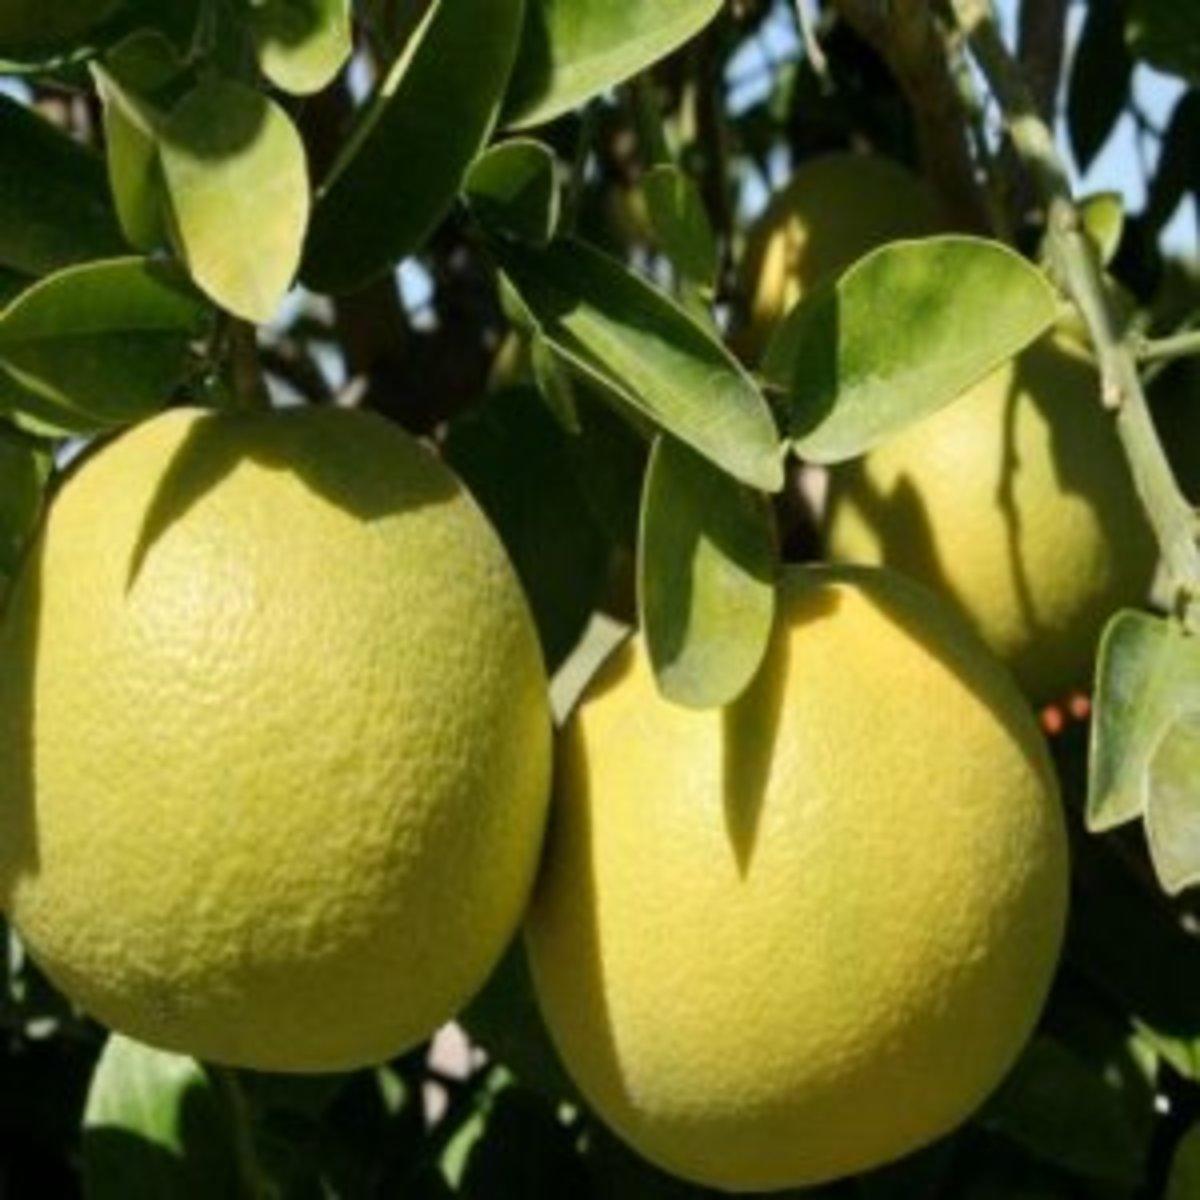 Ben3john photographed grapefruit growing in Kerala, India on October 17, 2012.